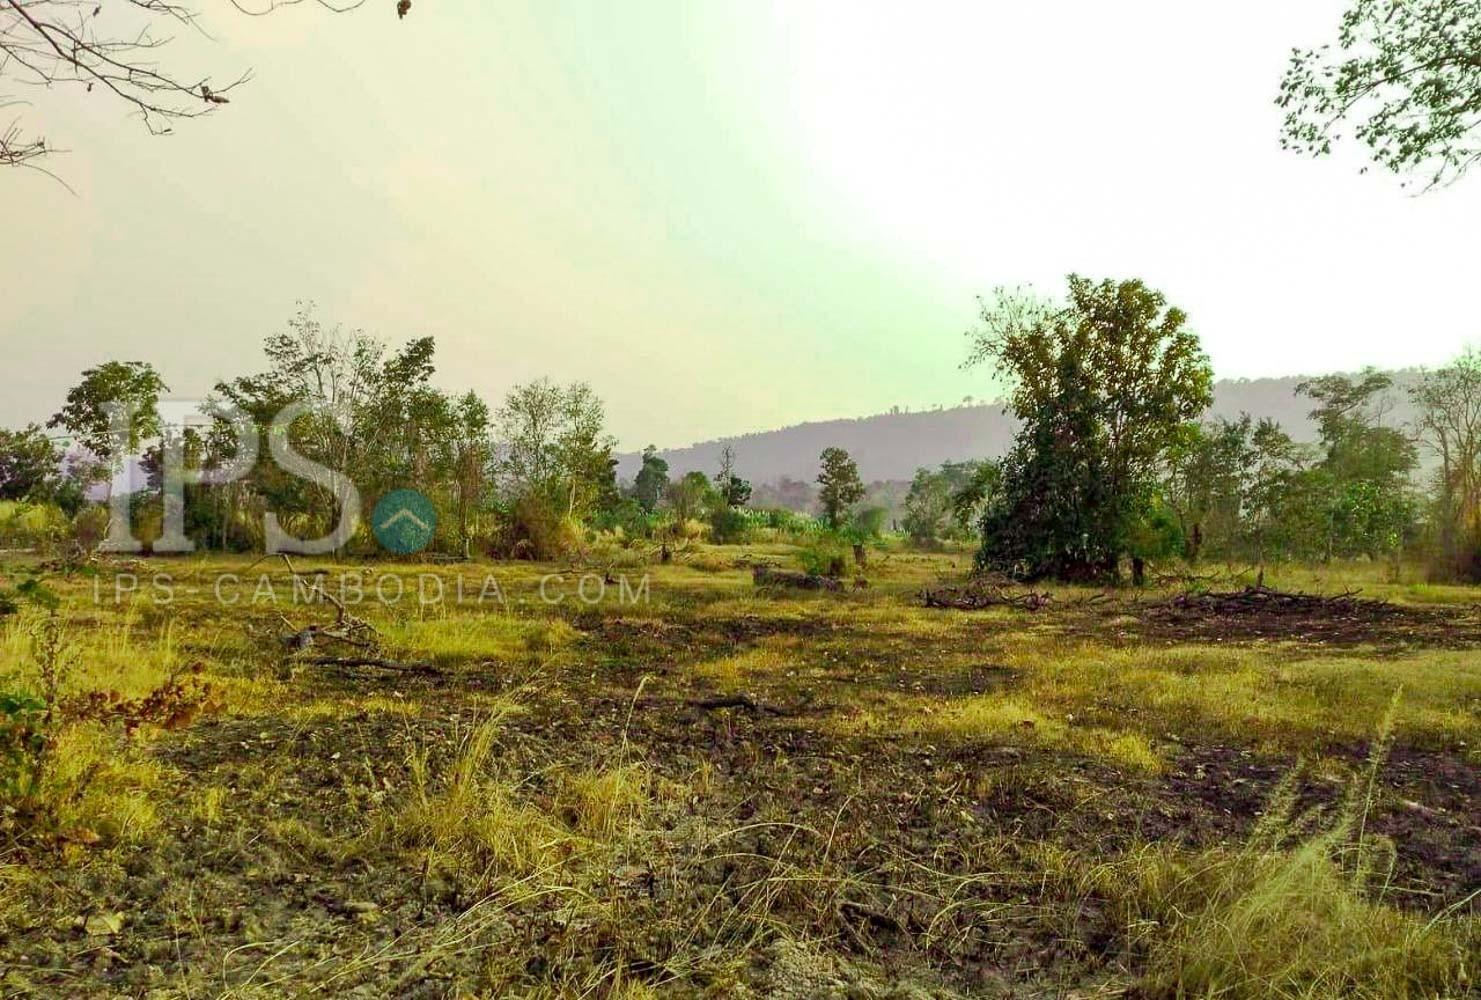 77,442 Sqm Land For Sale - Banteay Srei District, Siem Reap